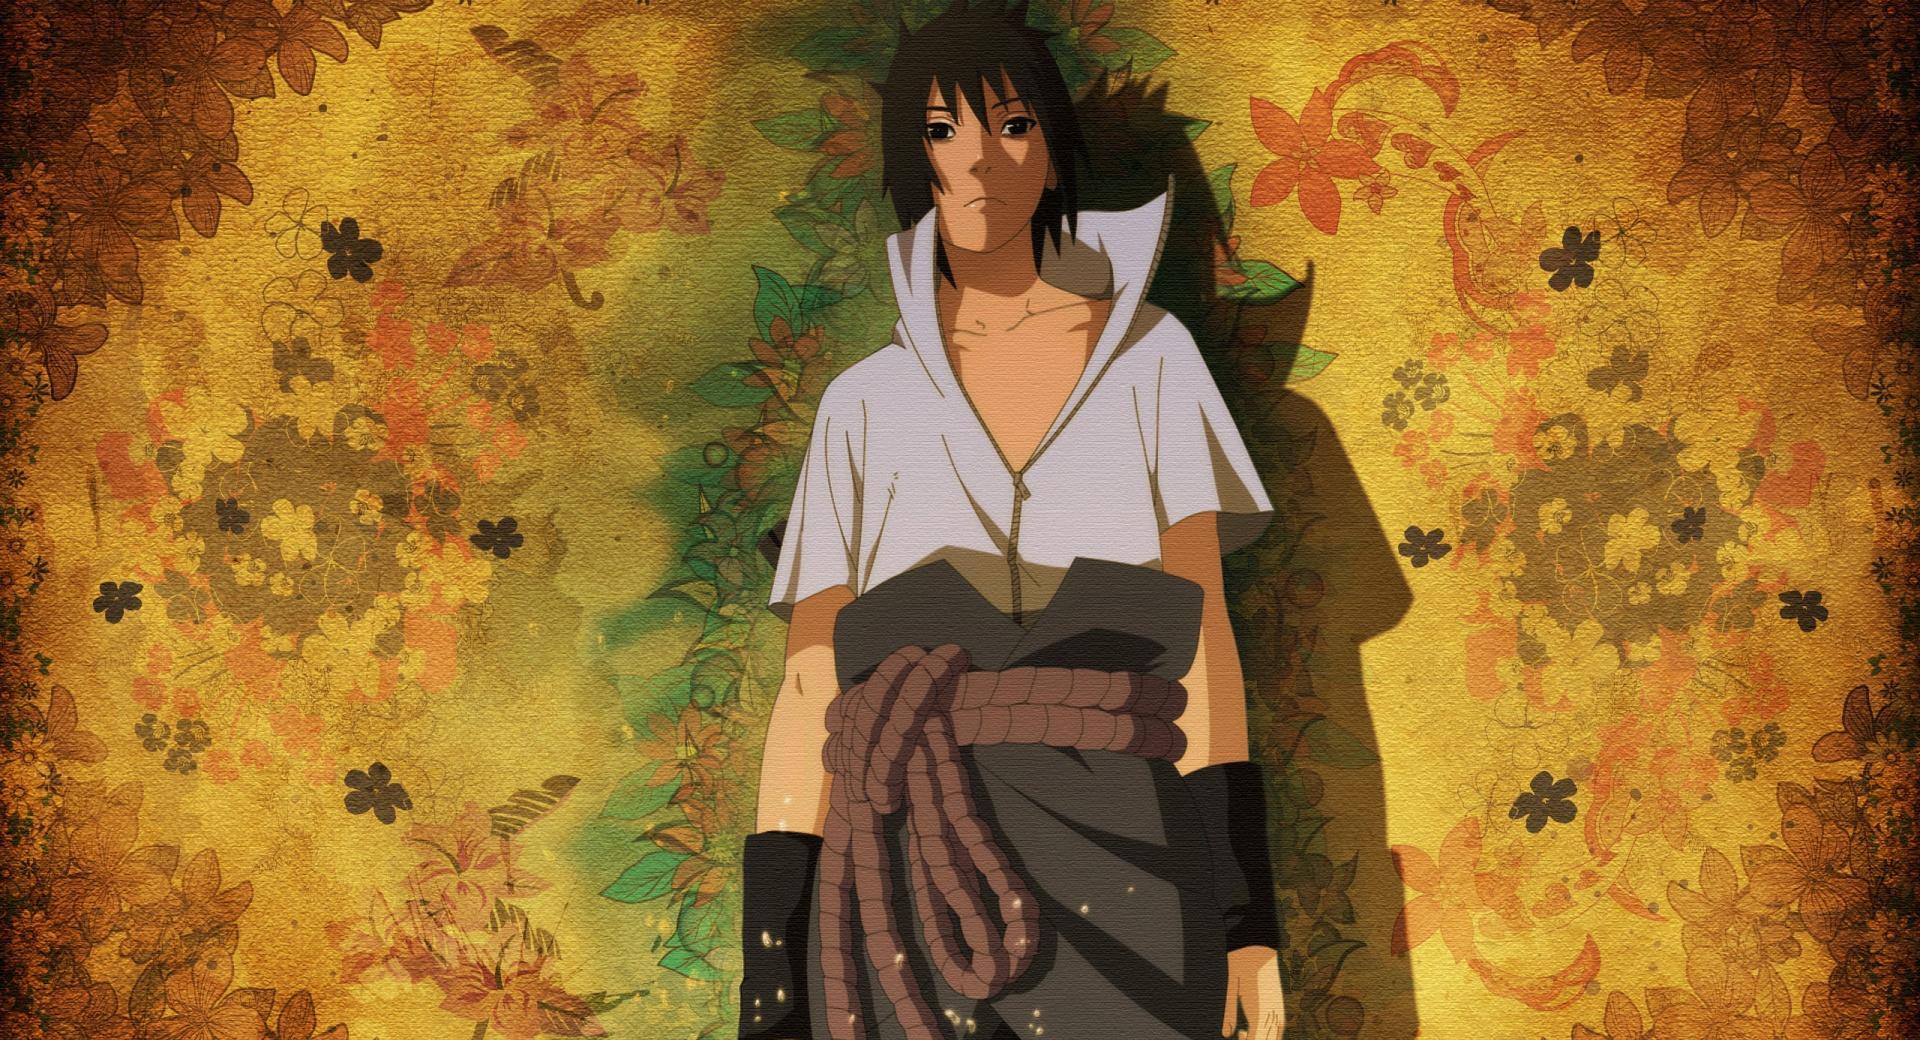 Uchiha Sasuke Naruto wallpapers HD quality